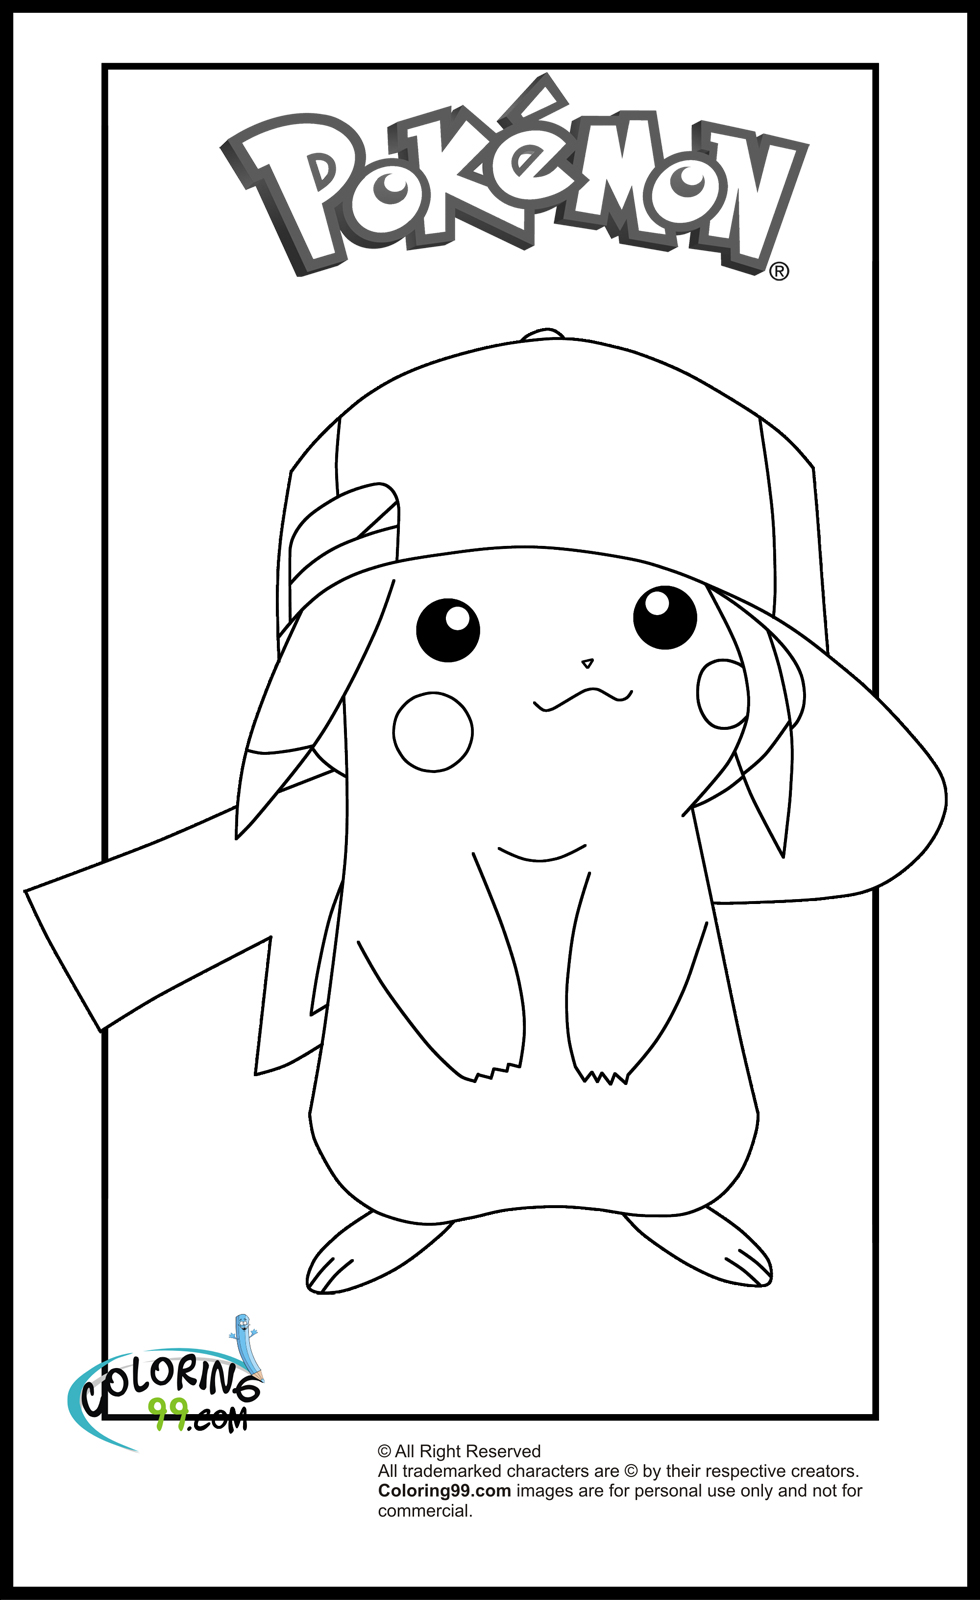 pikachu coloring page pikachu coloring pages team colors coloring pikachu page